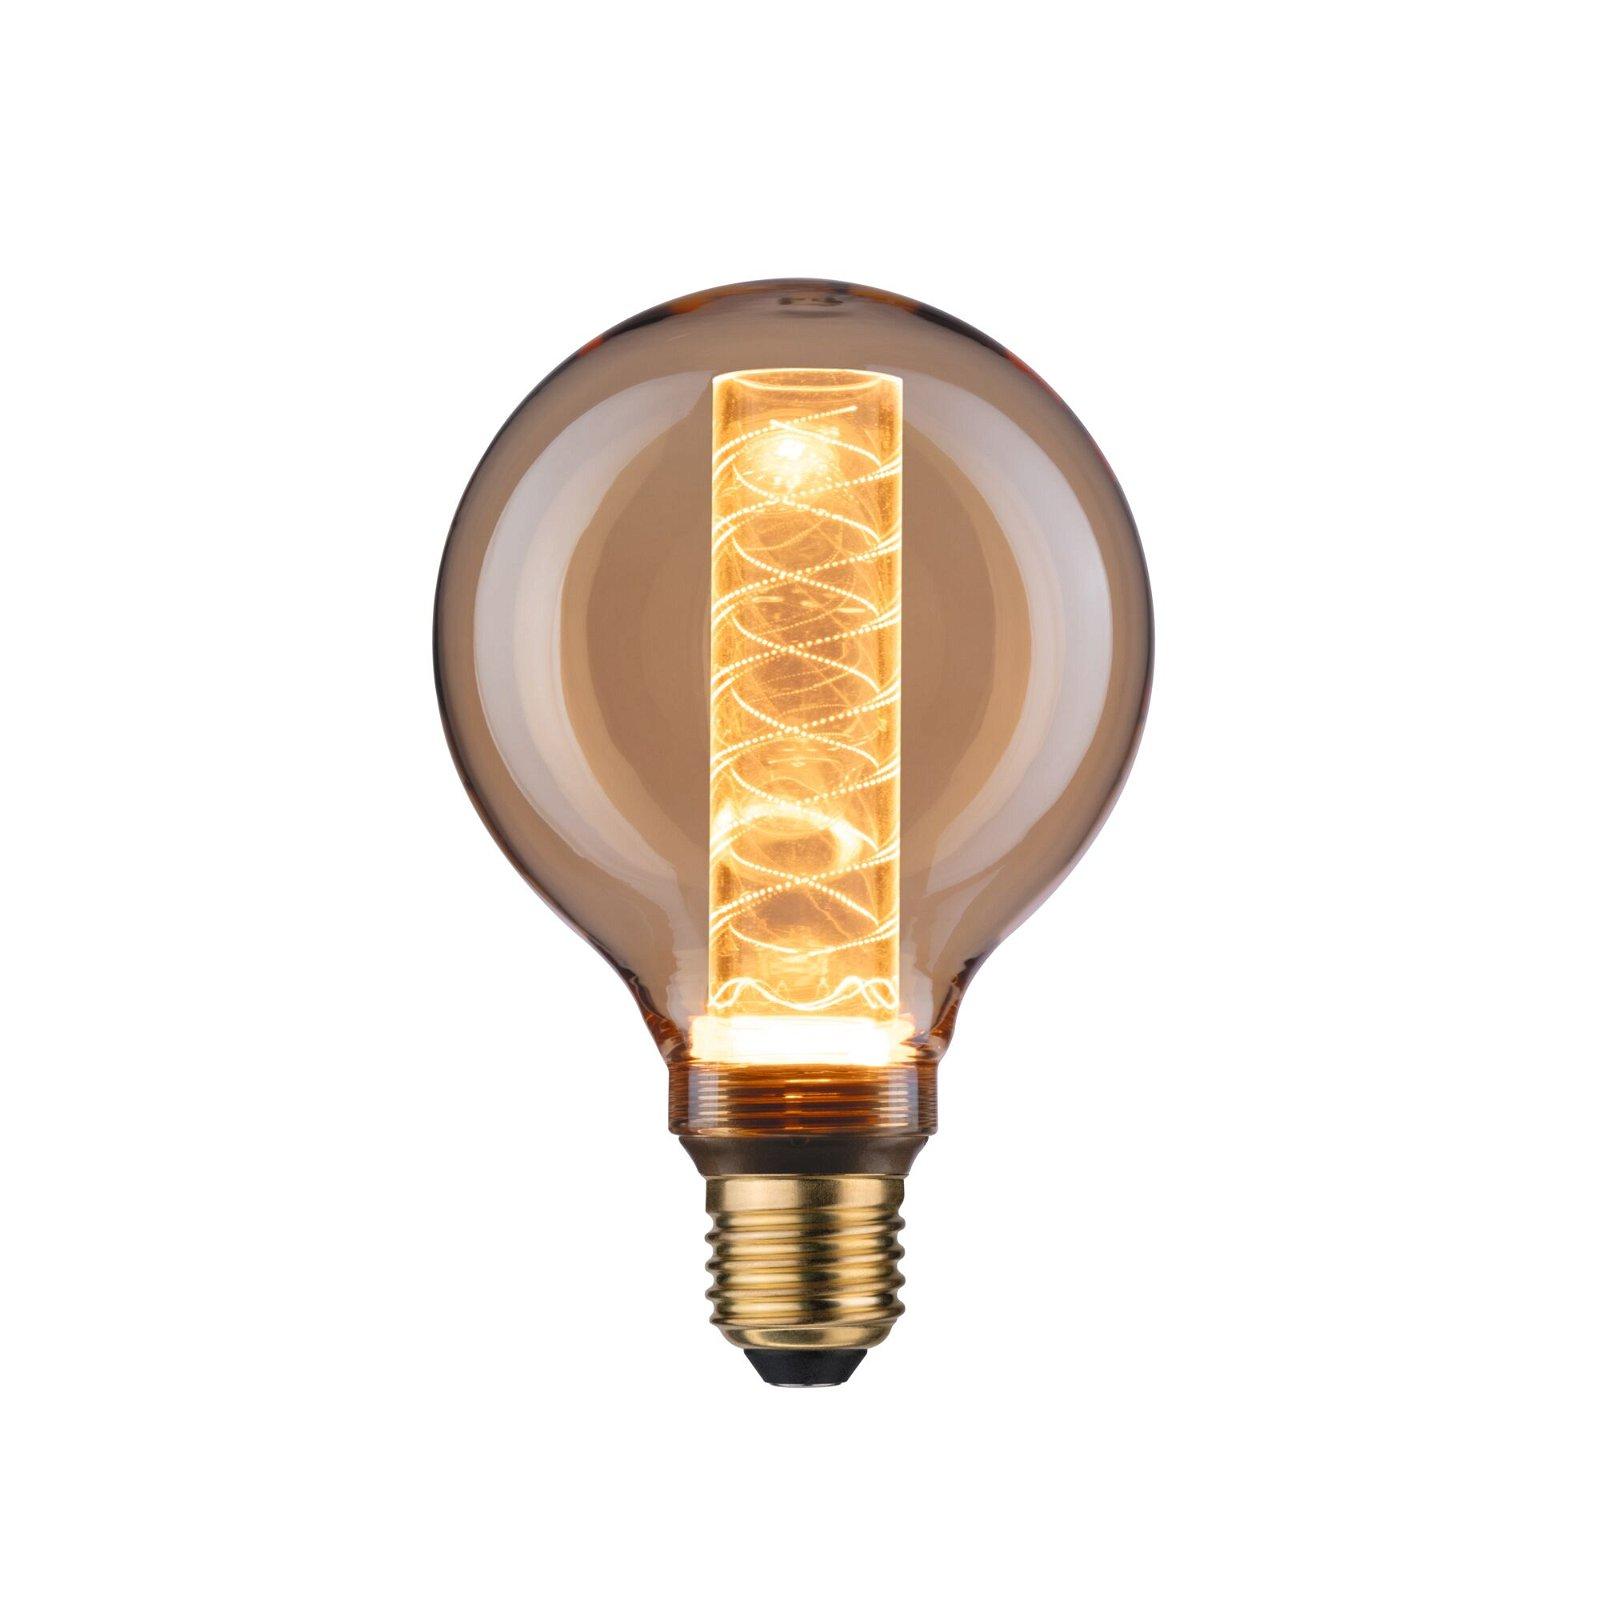 Inner Glow Edition LED Globe Innenkolben Spiralmuster E27 230V 200lm 4W 1800K Gold